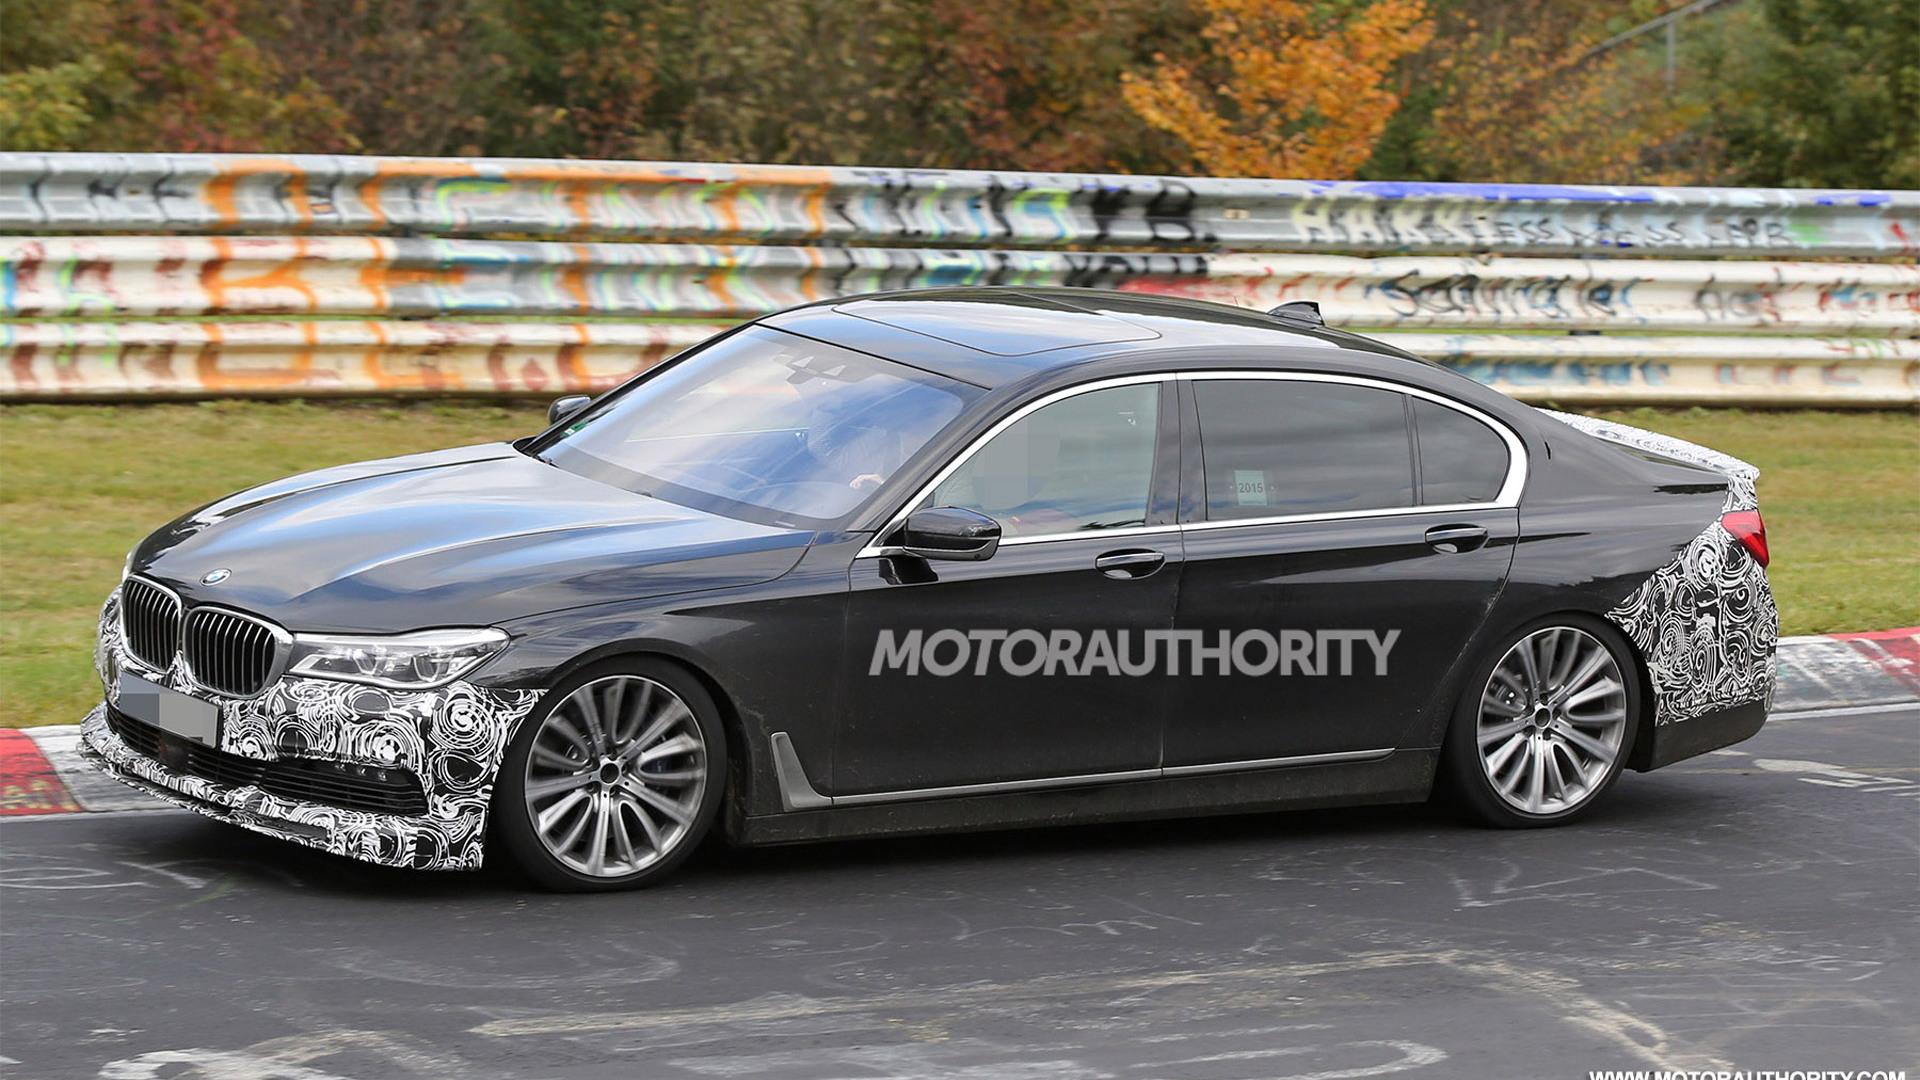 2017 BMW Alpina B7 spy shots - Image via S. Baldauf/SB-Medien